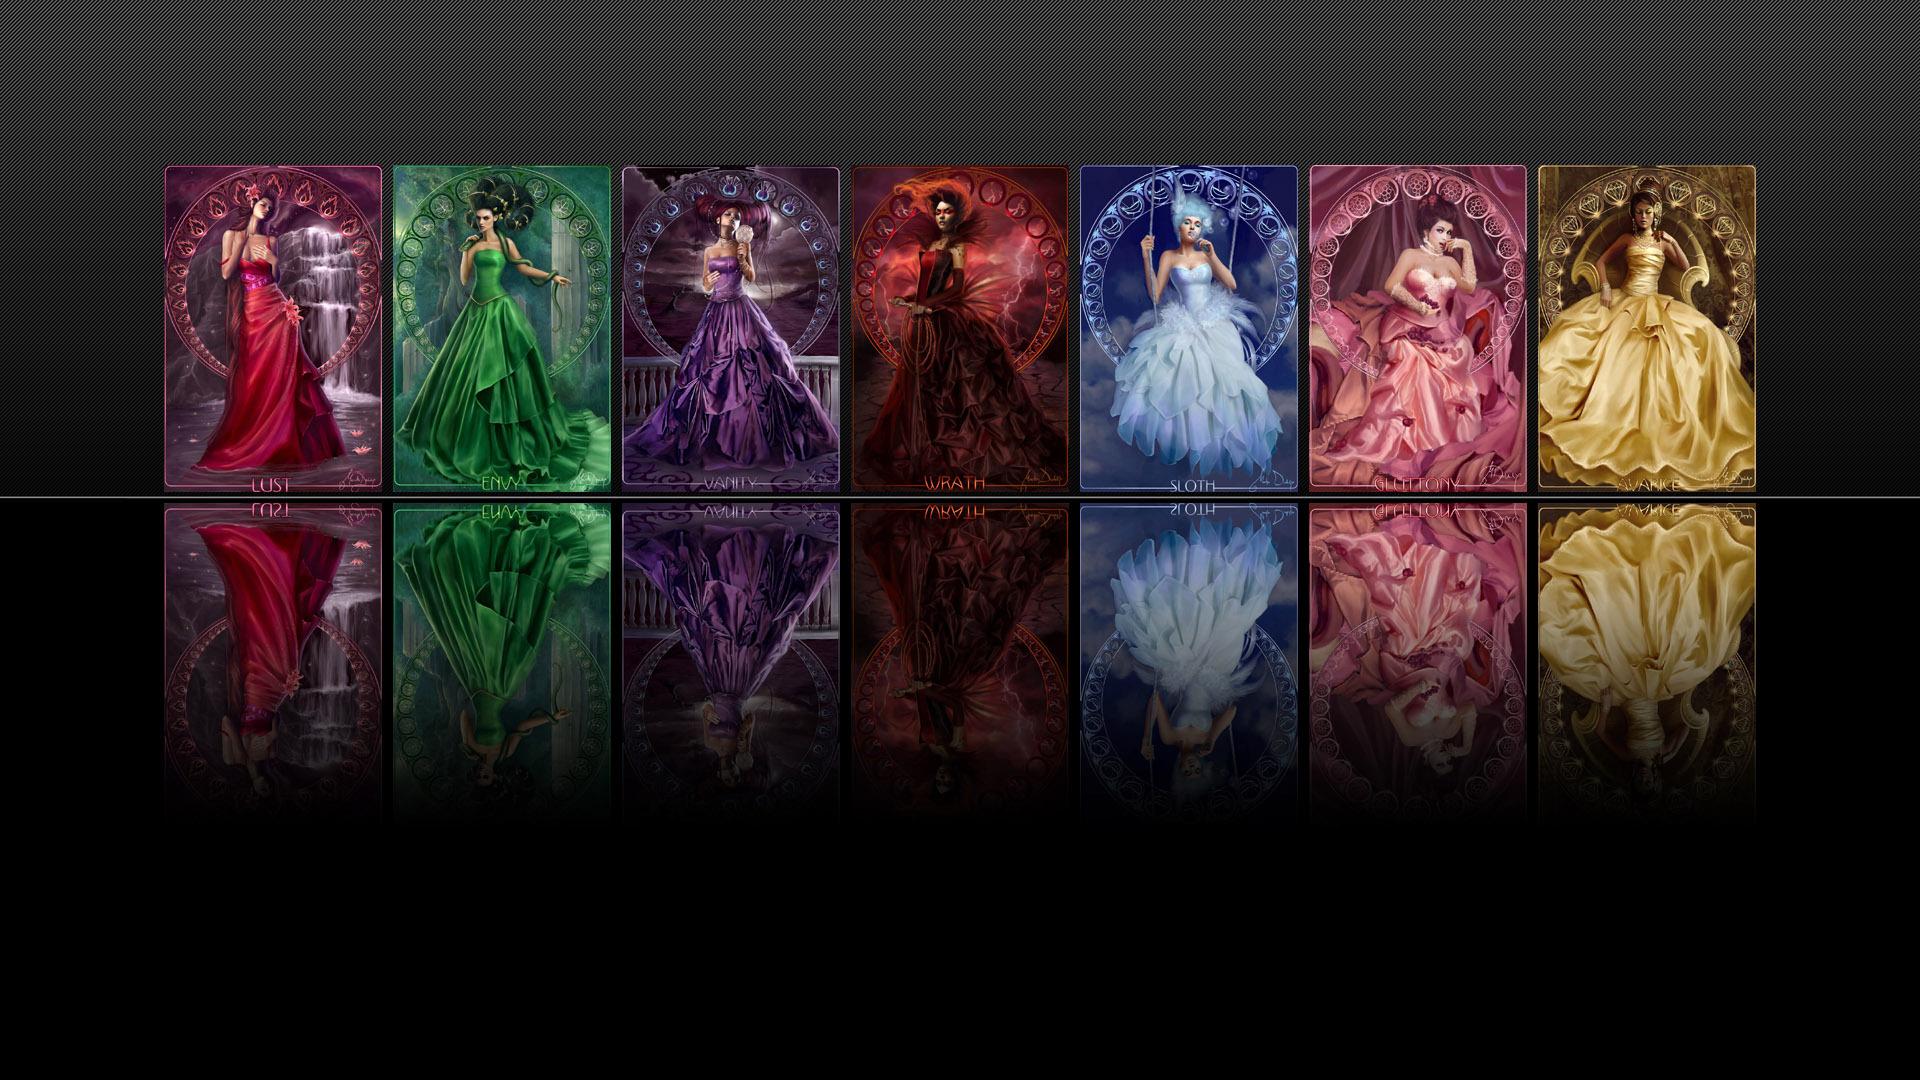 Seven Deadly Sins Wallpaper HD - WallpaperSafari